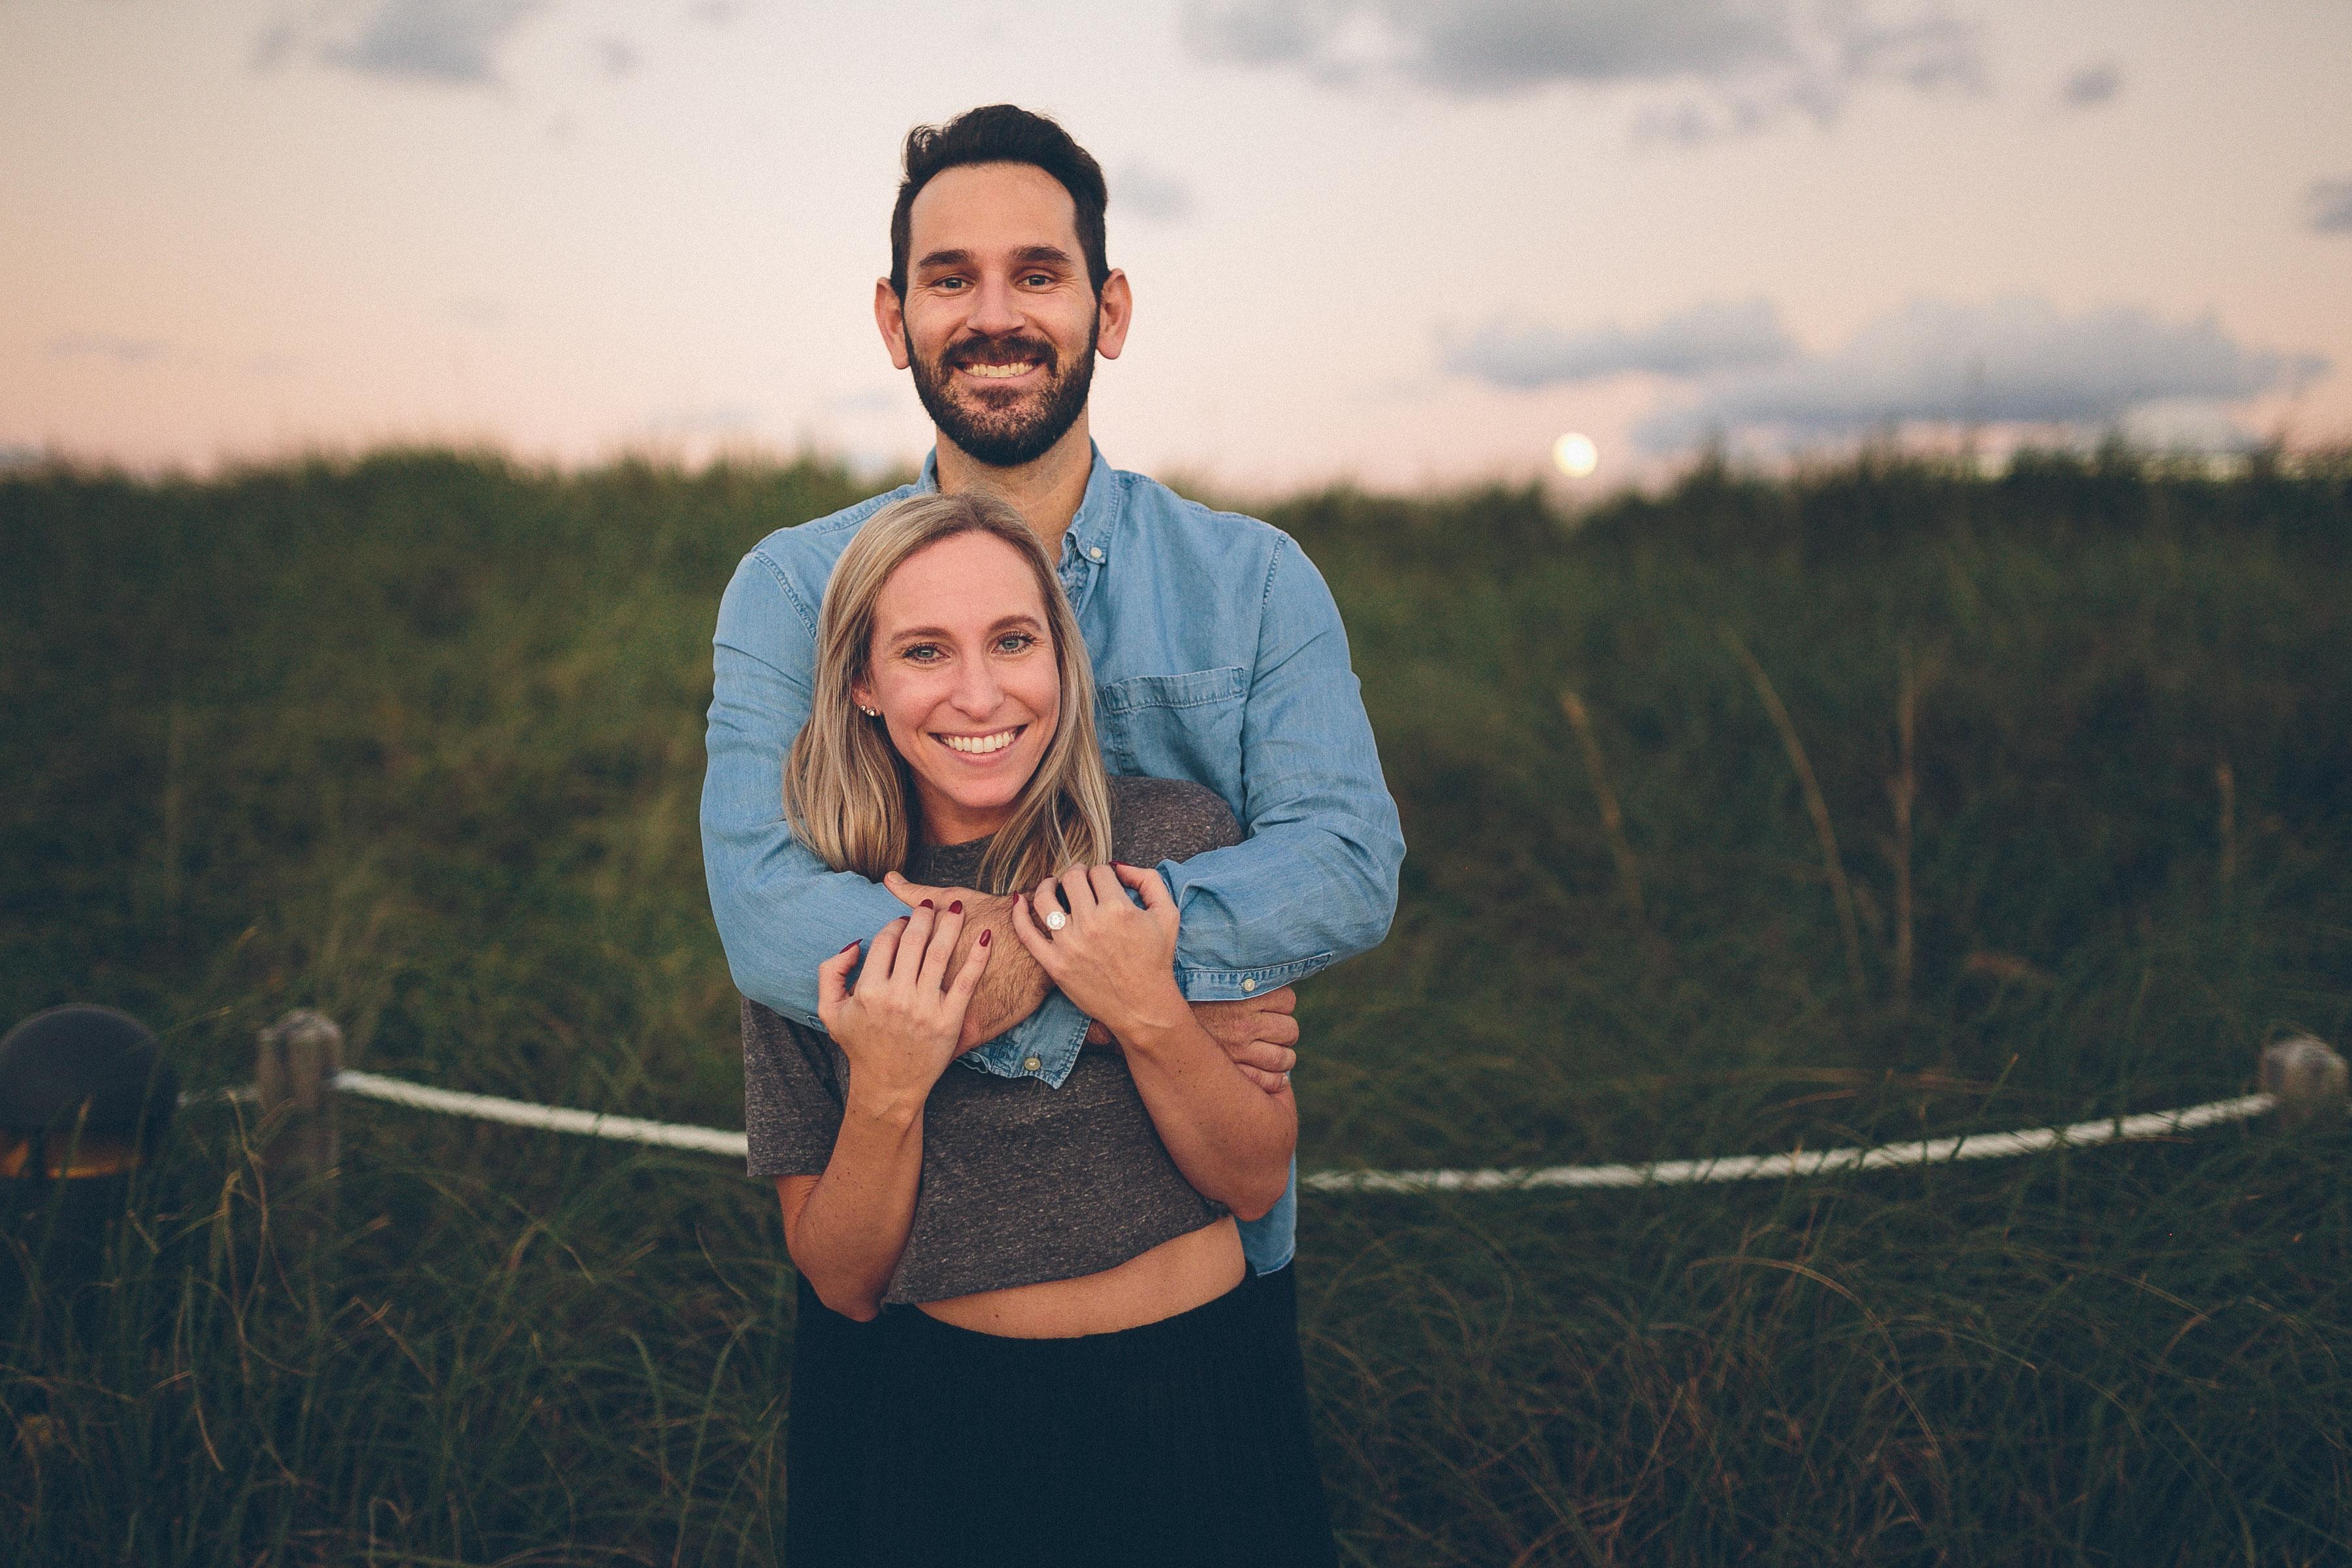 Image 2 of Leah and Carlos